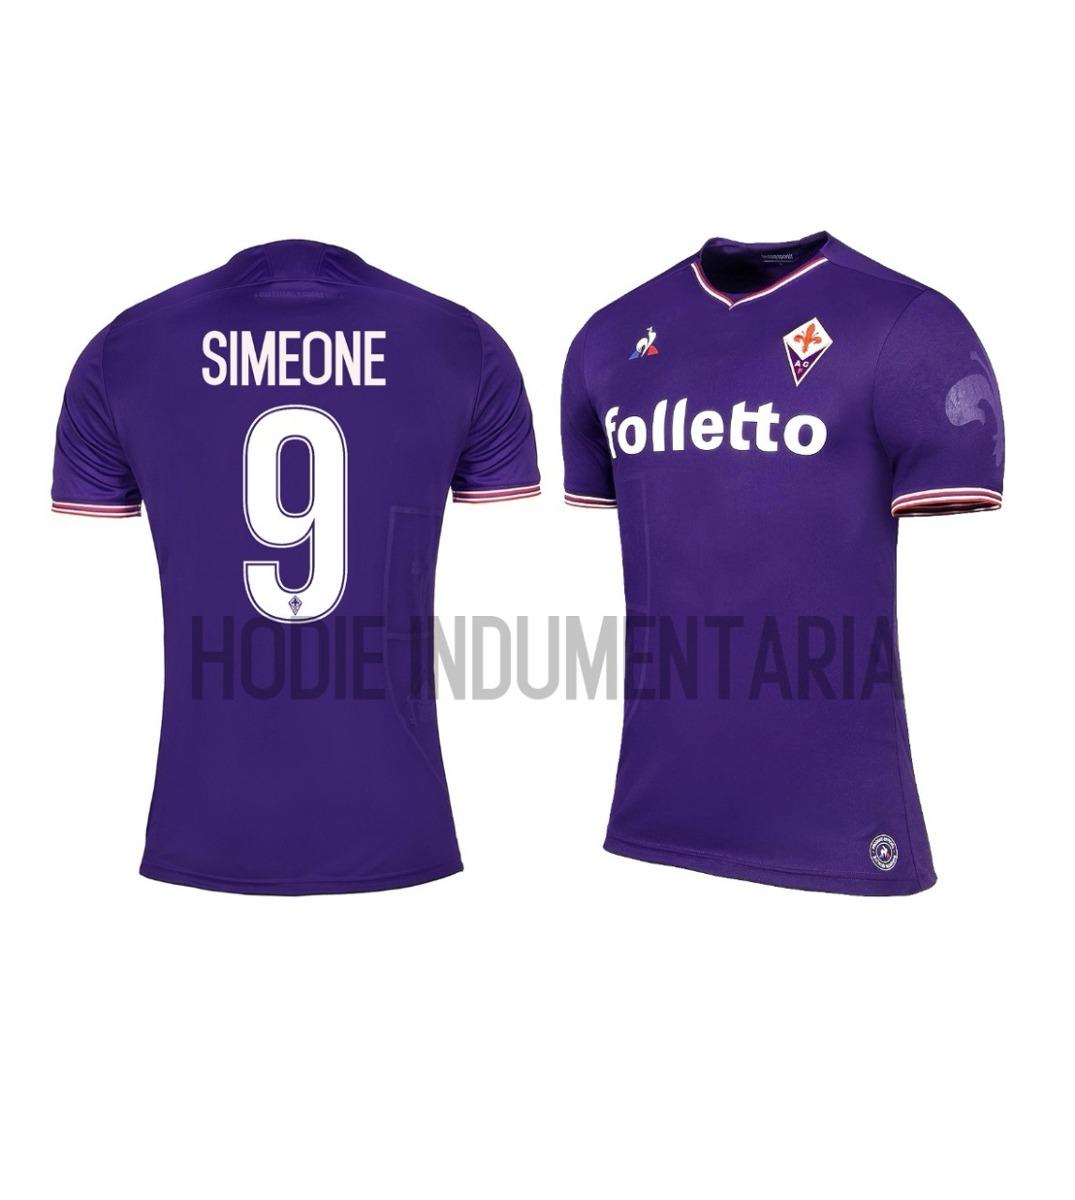 comprar camiseta Fiorentina deportivas